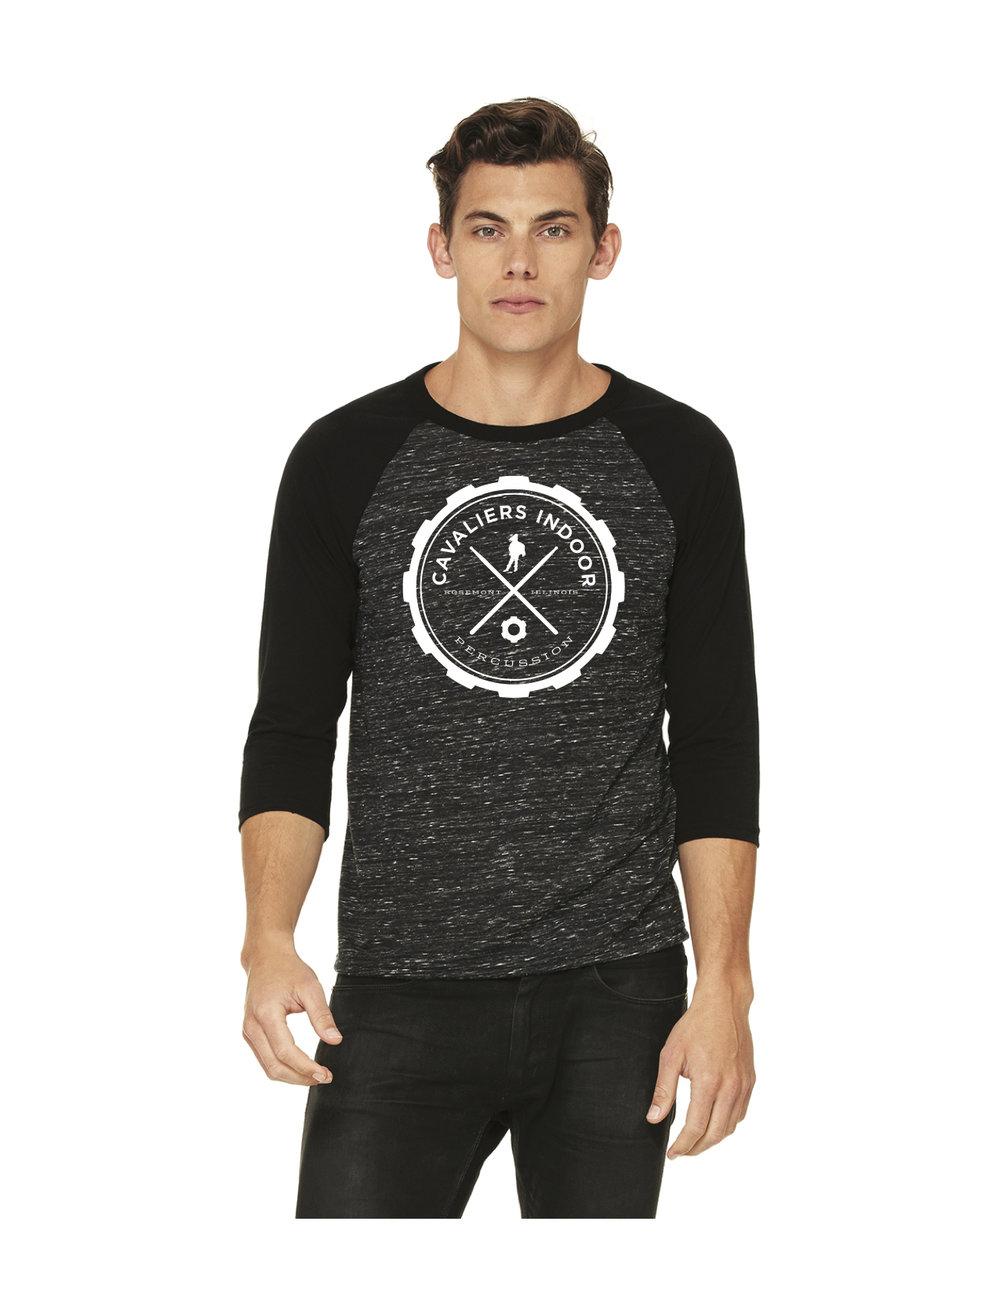 CIP Baseball T-Shirt.jpg